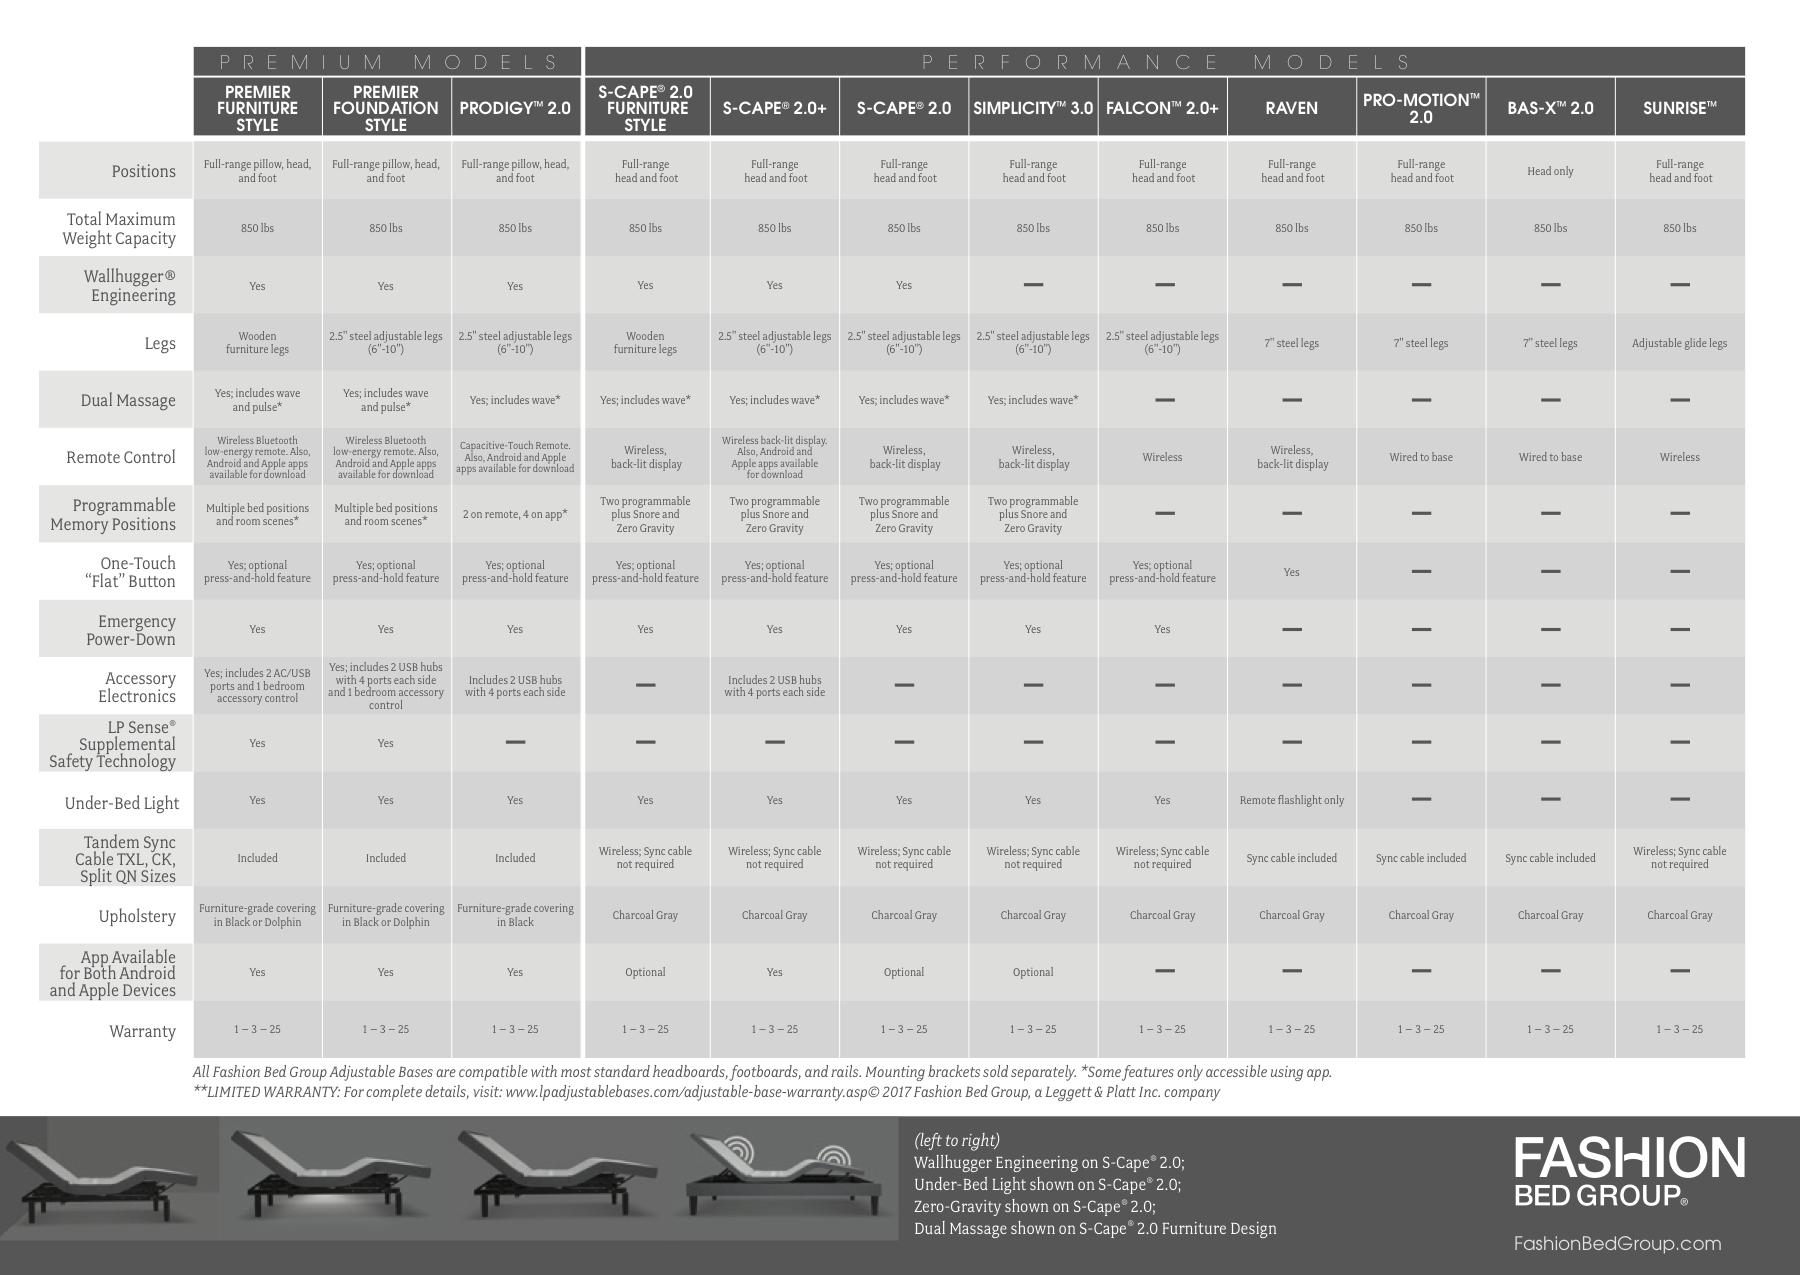 leggett-comparison-brochure.5.png